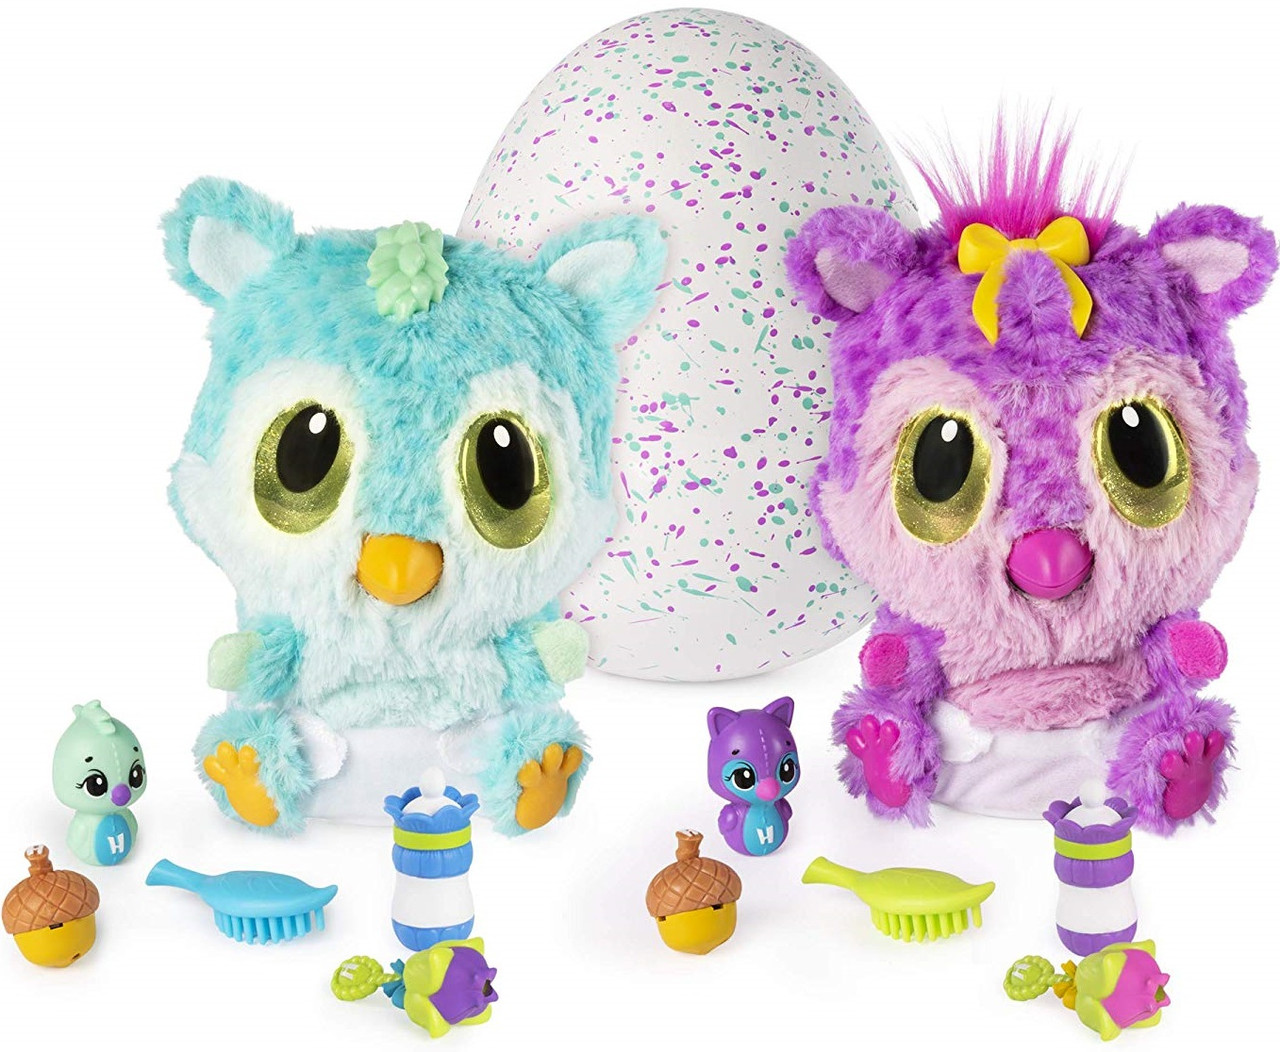 Hatchimals Chipadee Интерактивное яйцо, Чипади Хатчималс малыш в яйце, Spin Master Оригинал из США